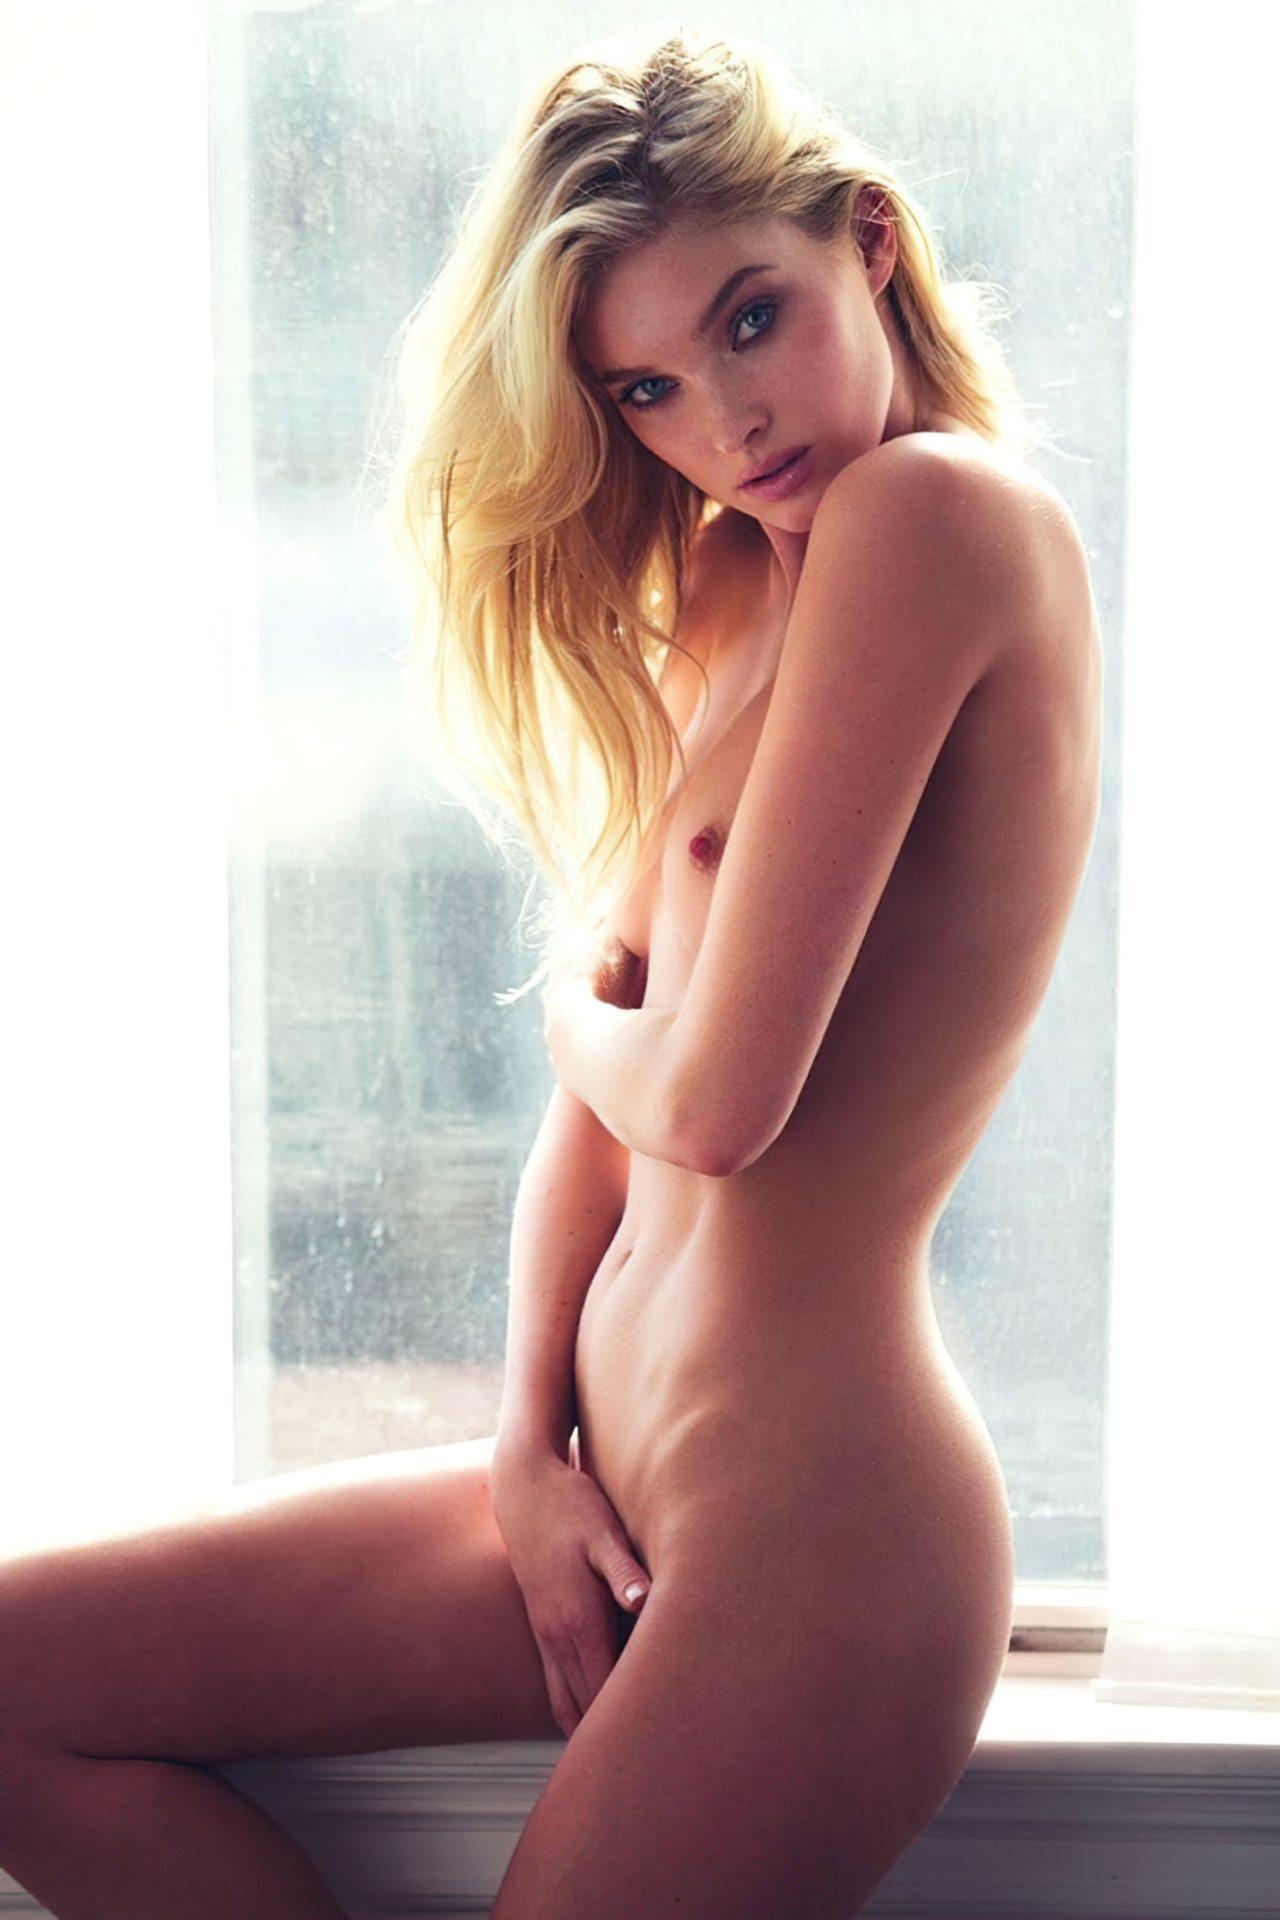 Fotos Mulheres Nuas (18)